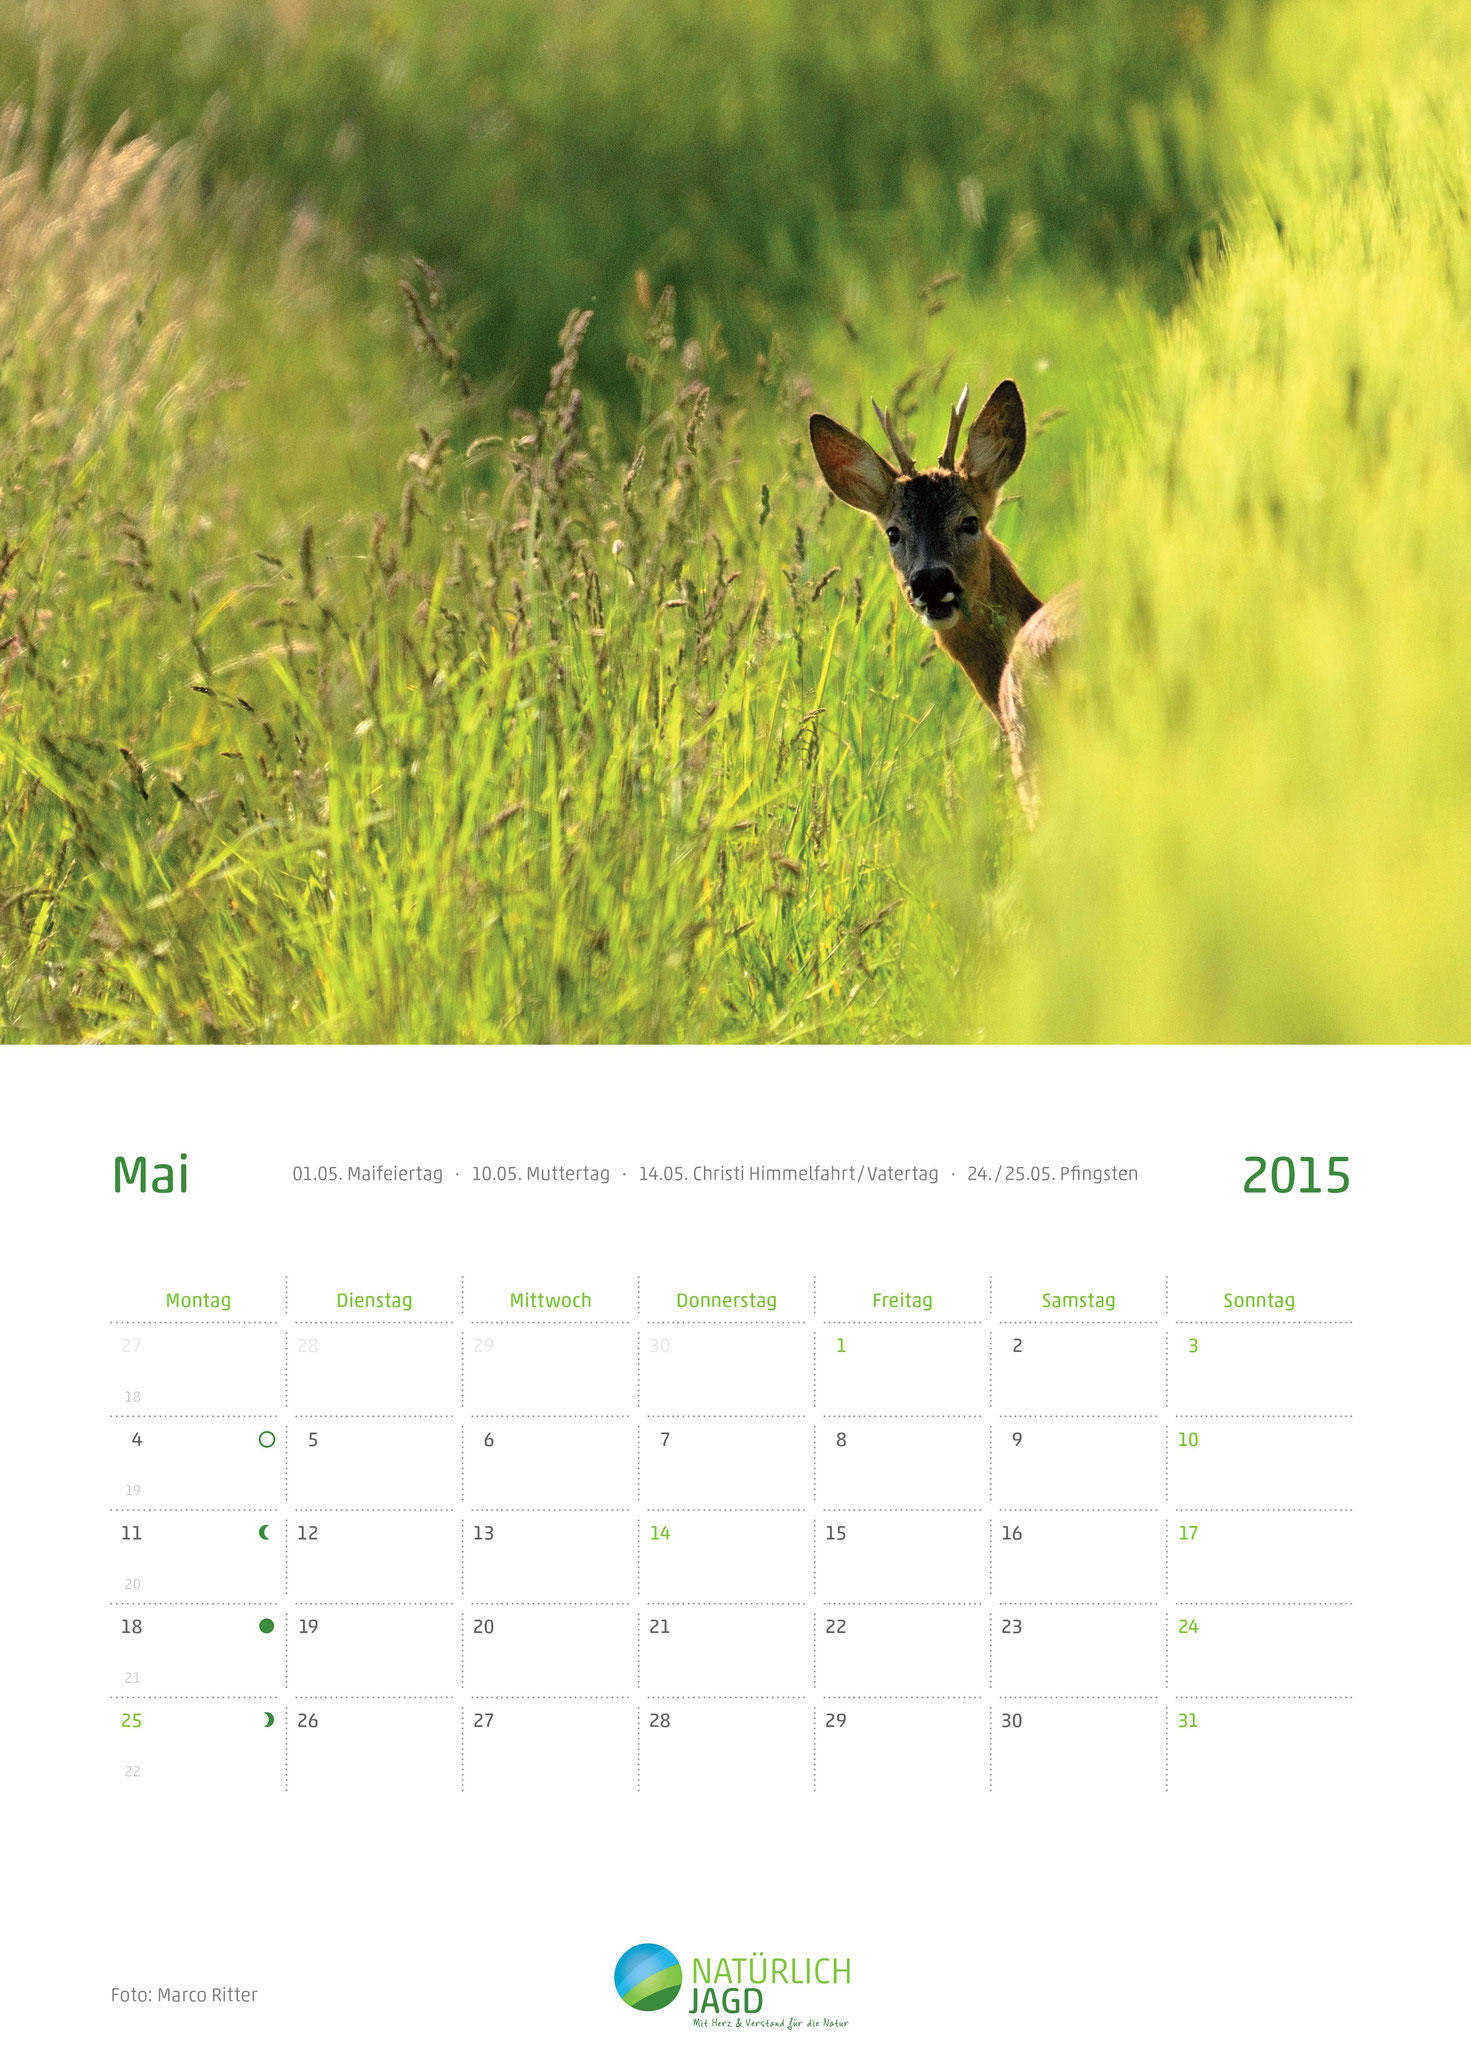 """Natürlich Jagd Fotoreporter"" des Monats Mai 2014 der Jägerstiftung natur+mensch"